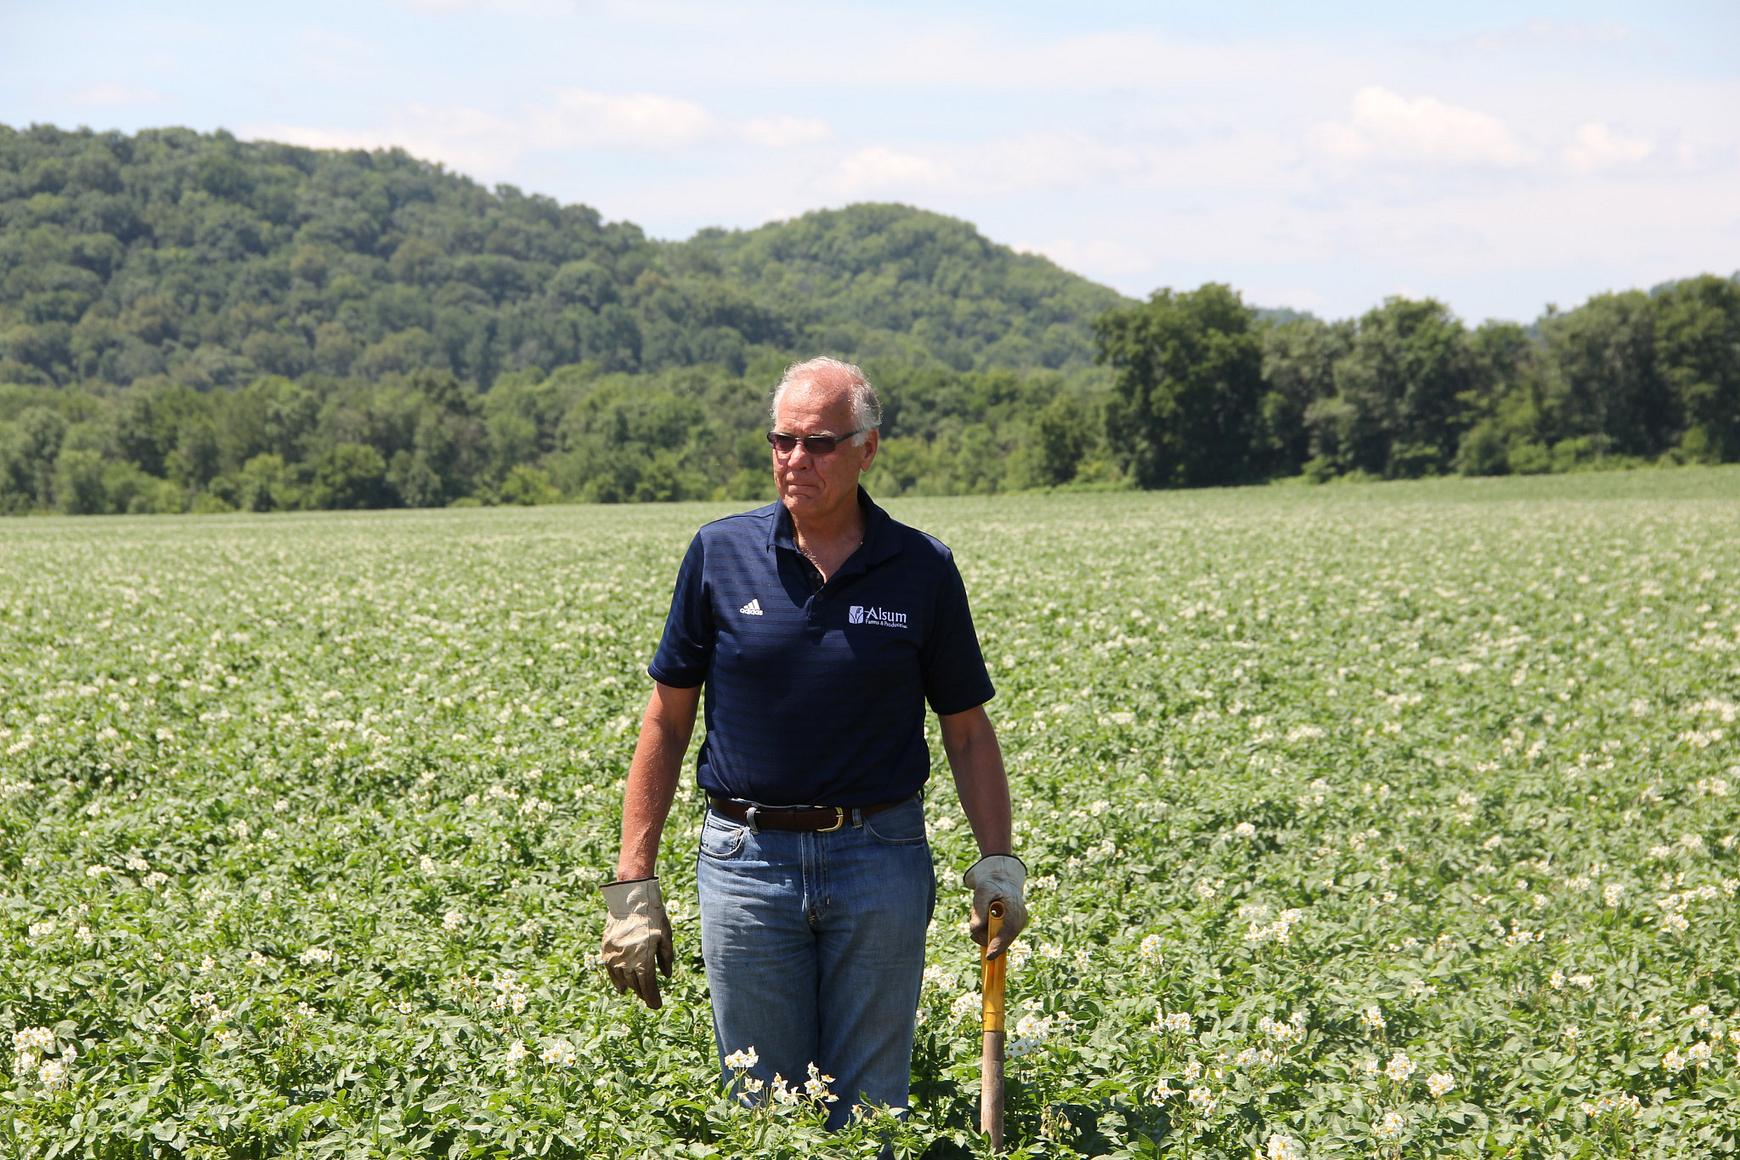 Photo of man standing in field of potato plants